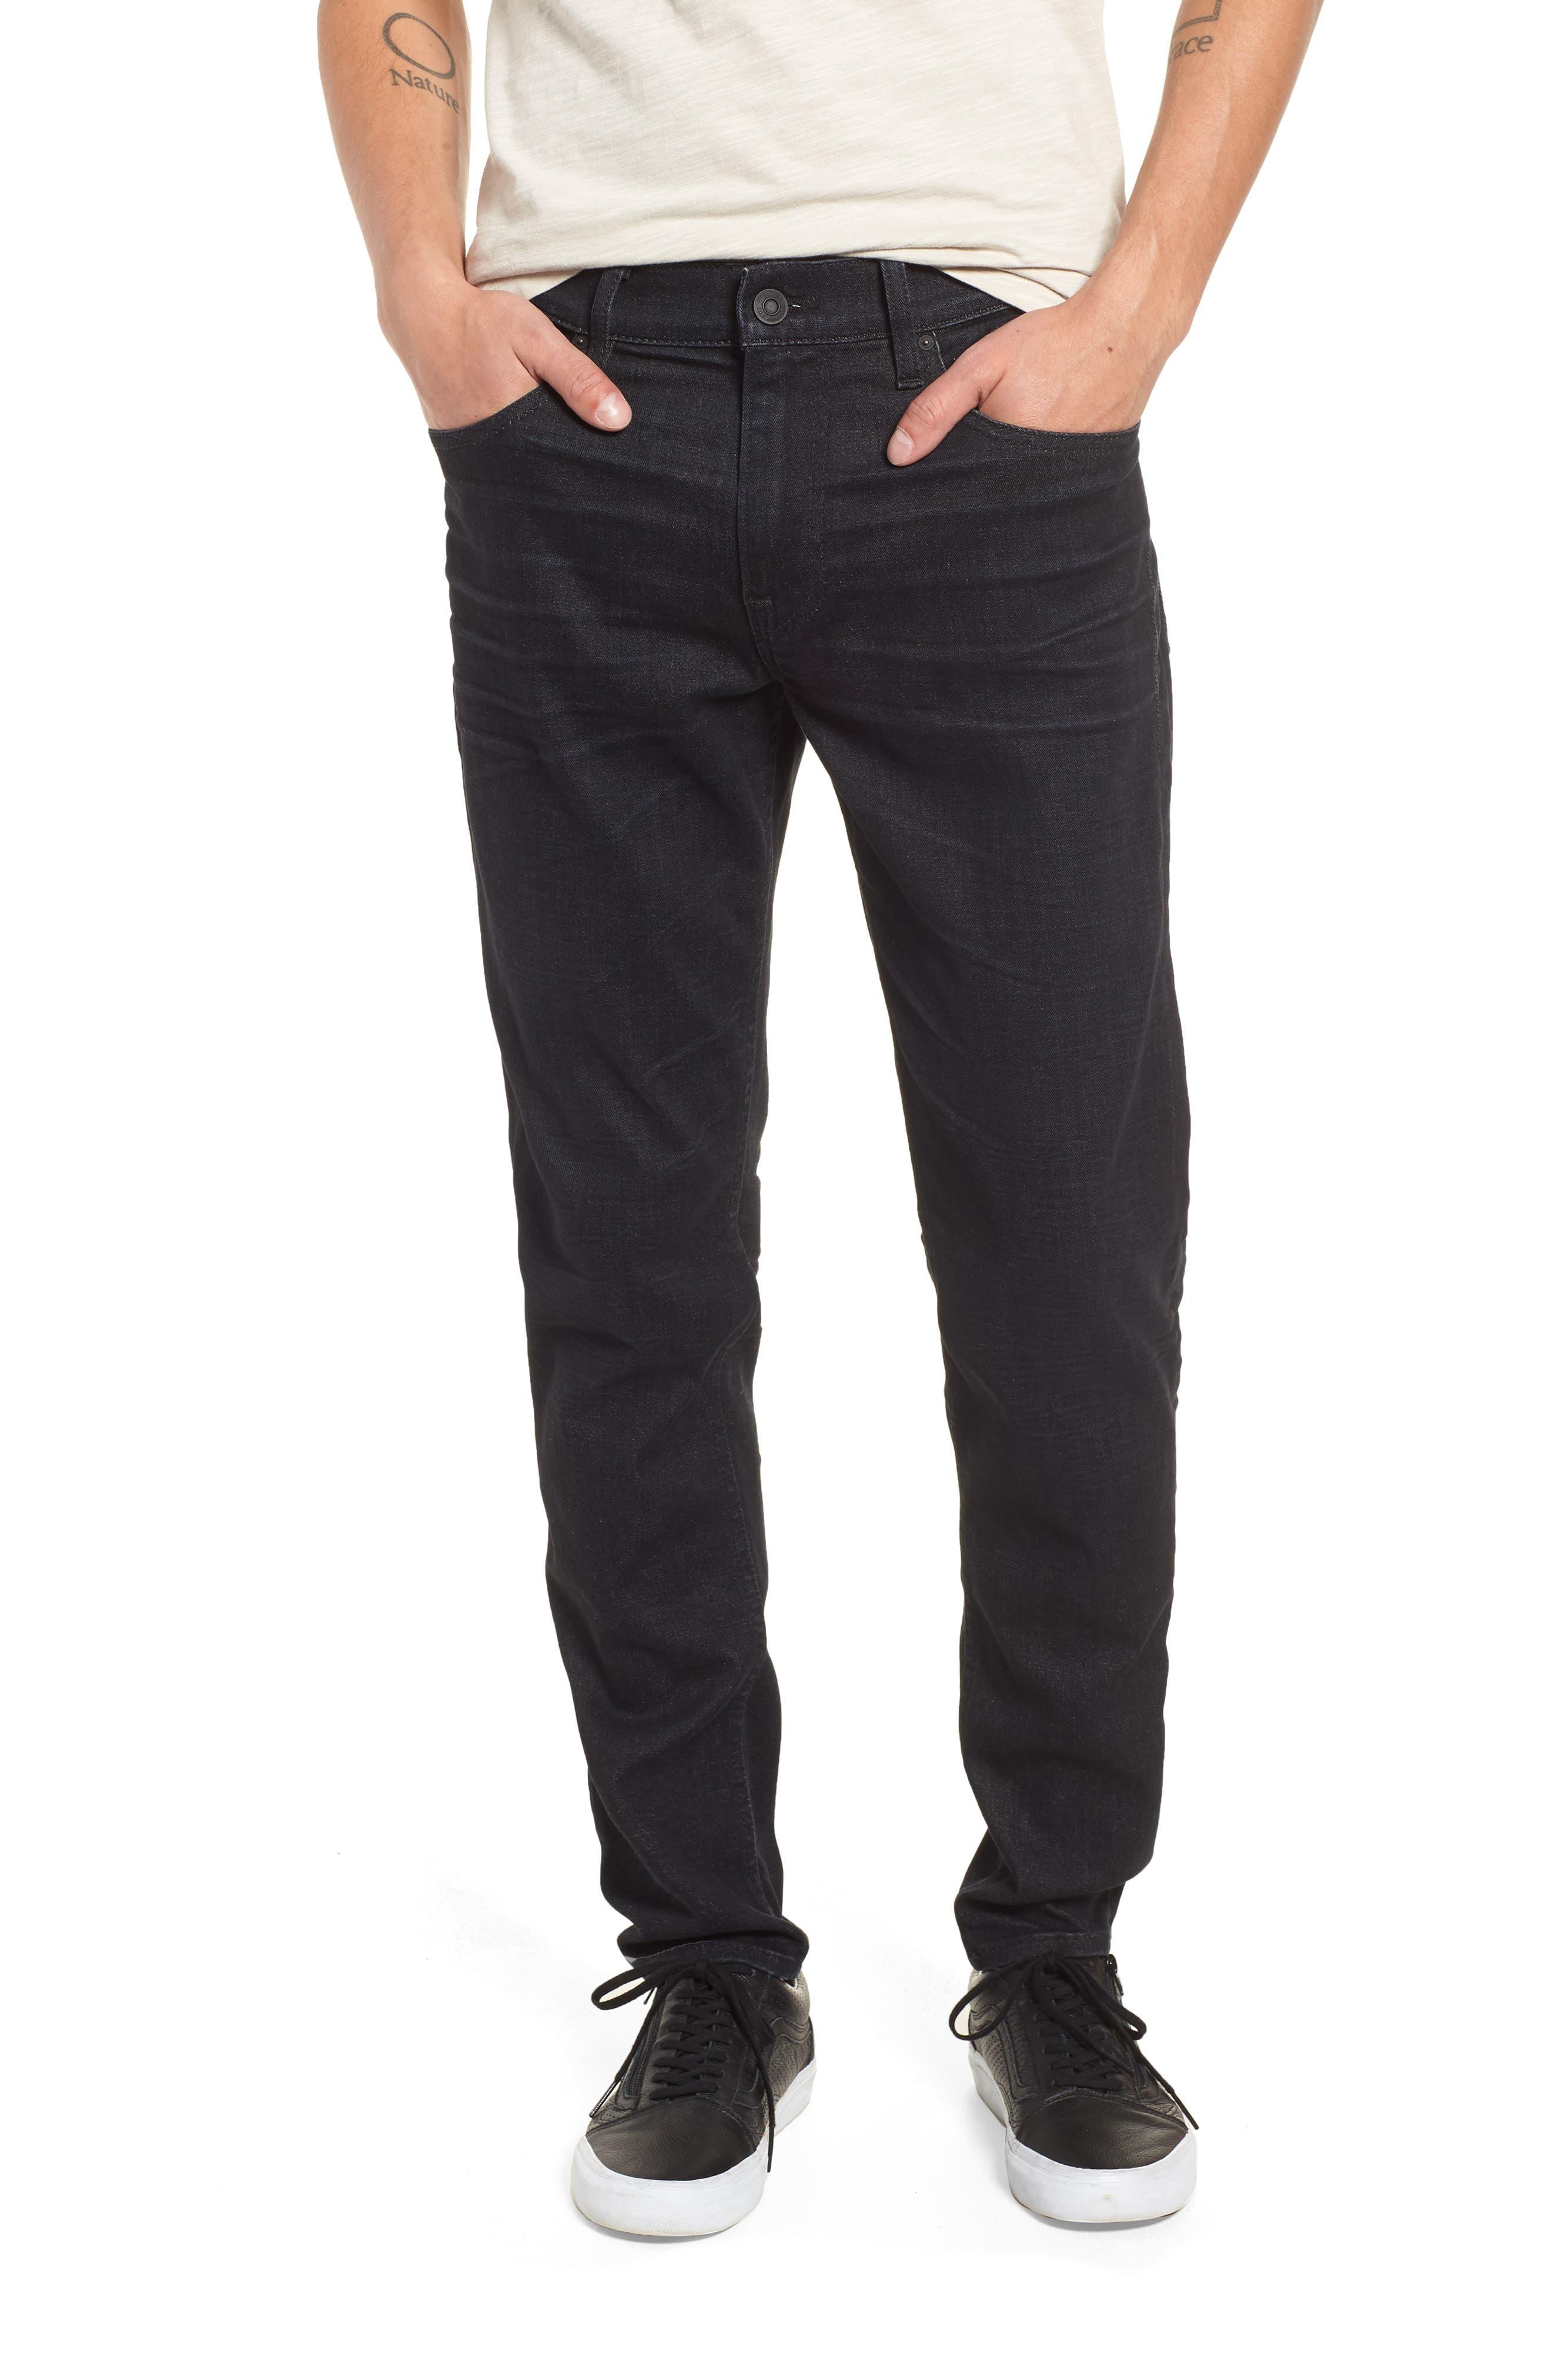 Zack Skinny Fit Jeans,                         Main,                         color, 001